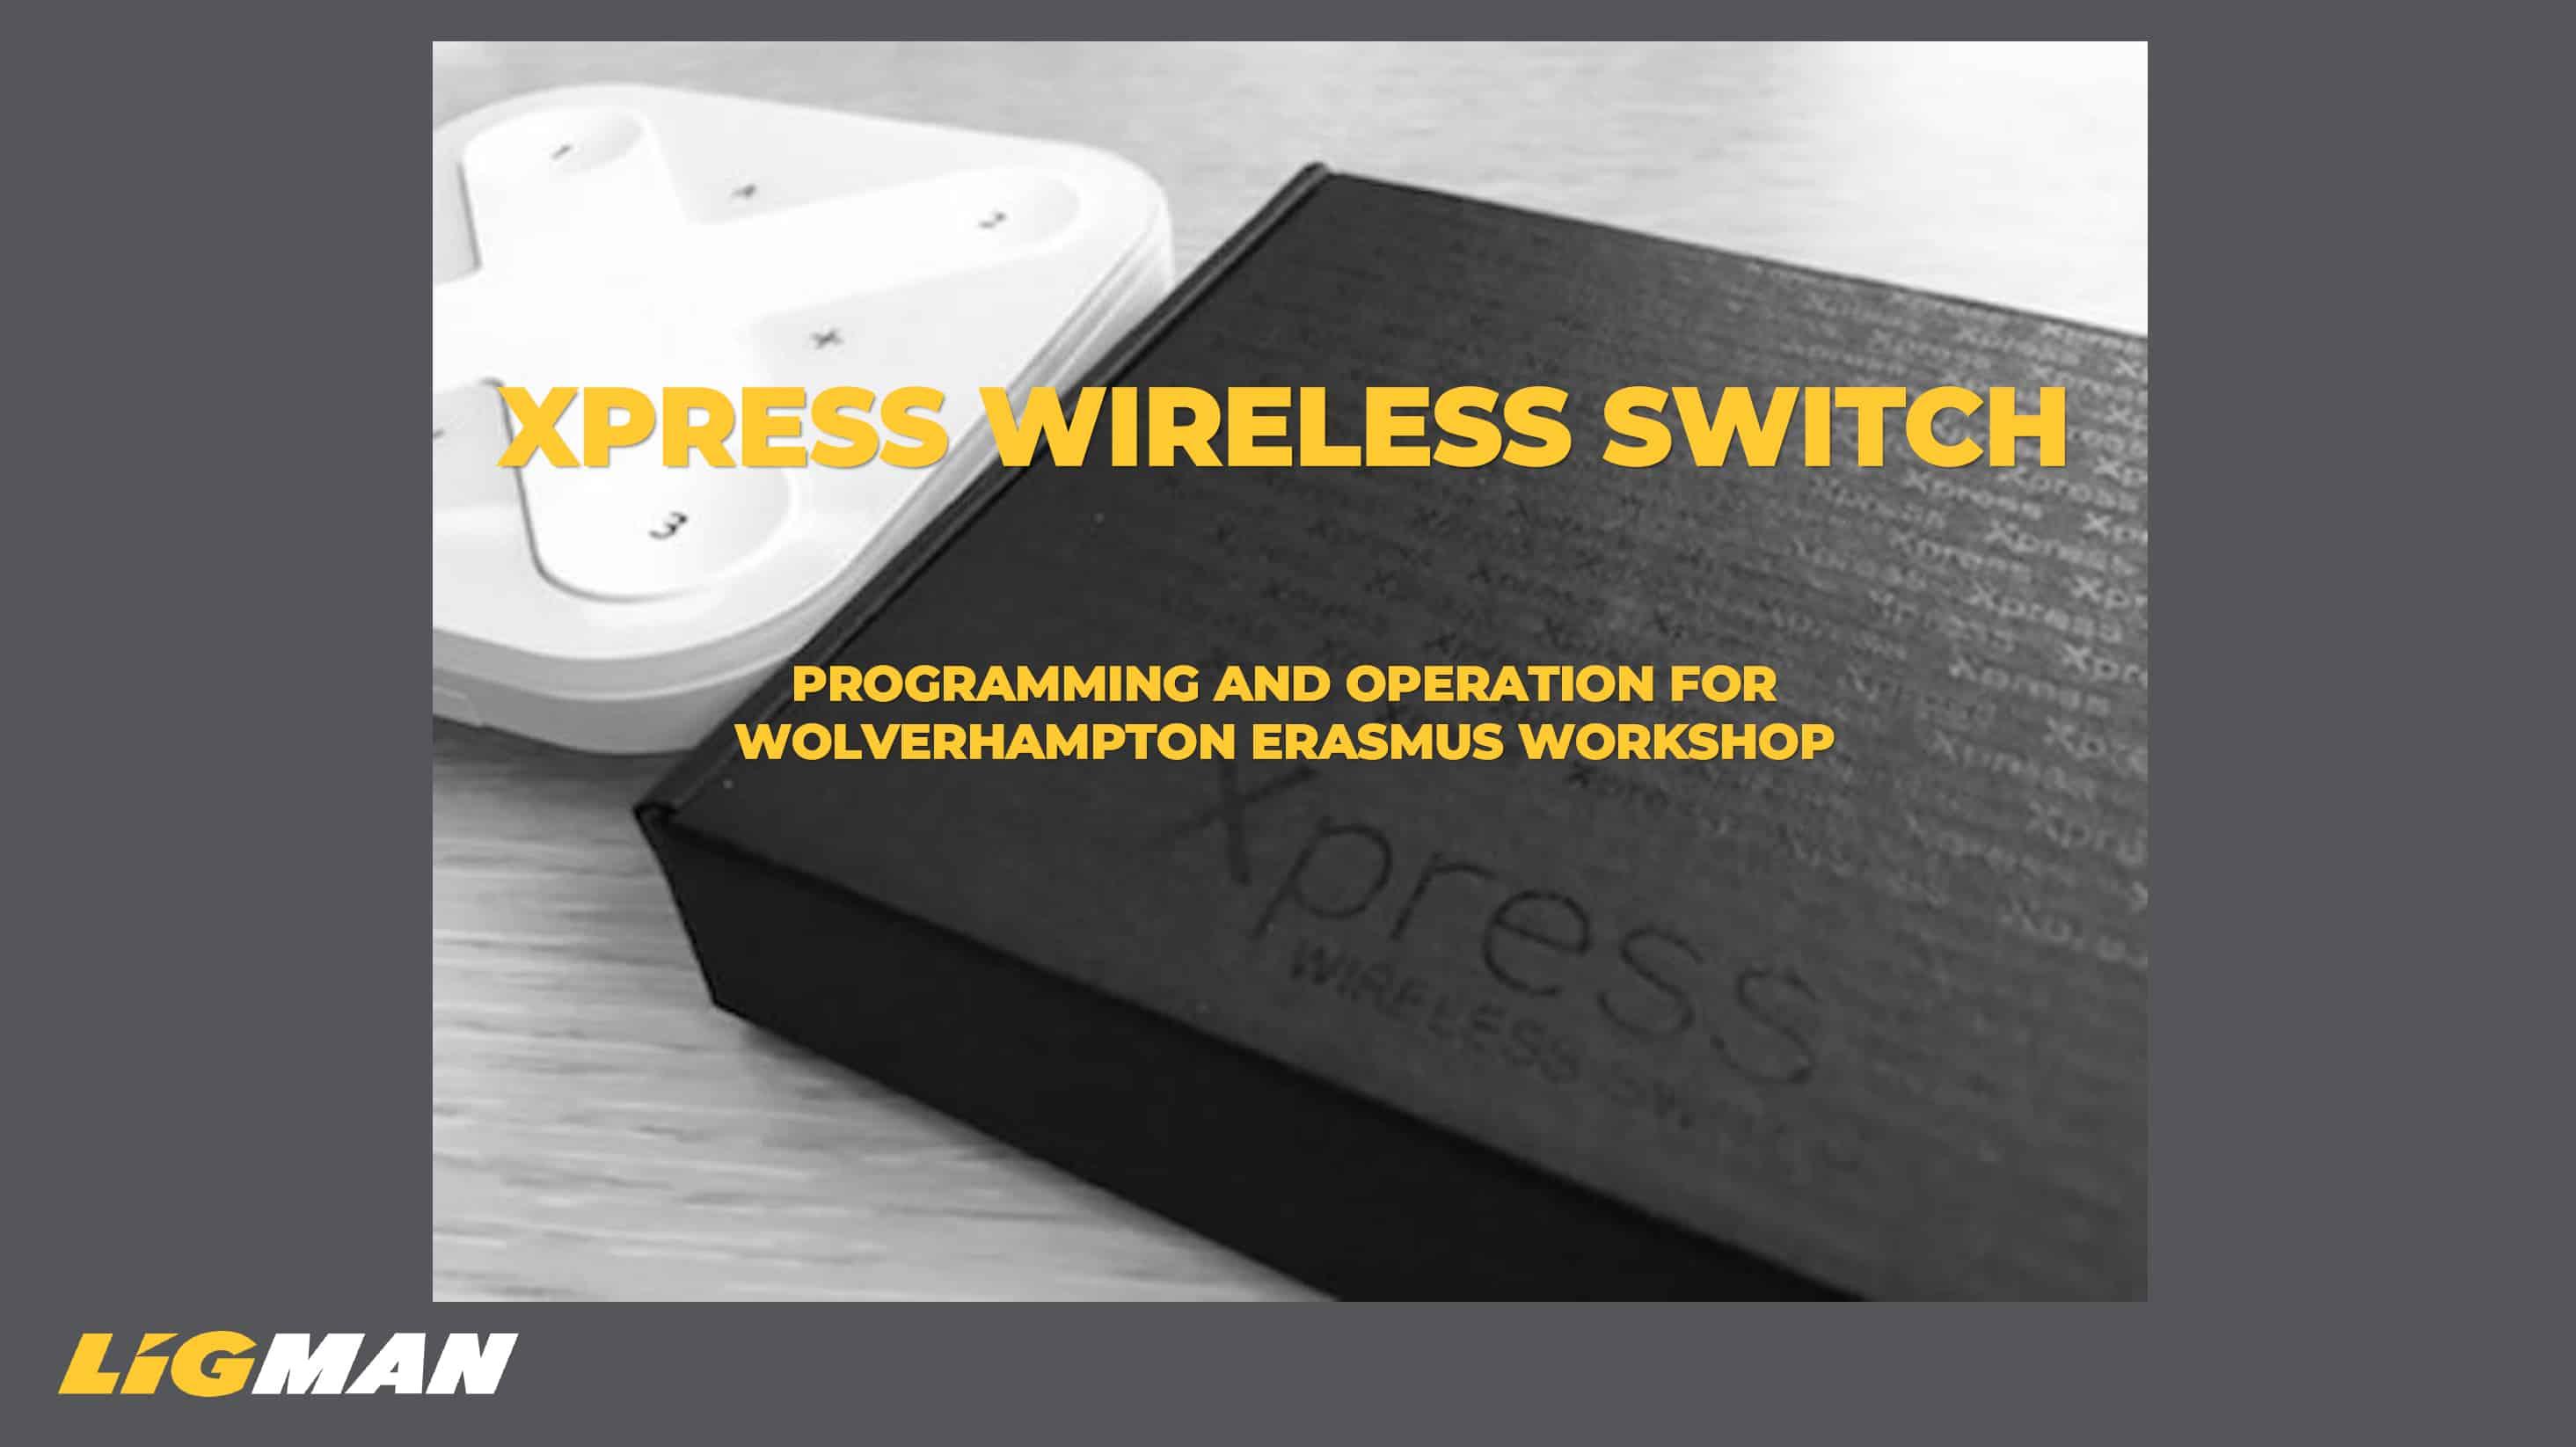 Accessories: Press Wireless Switch